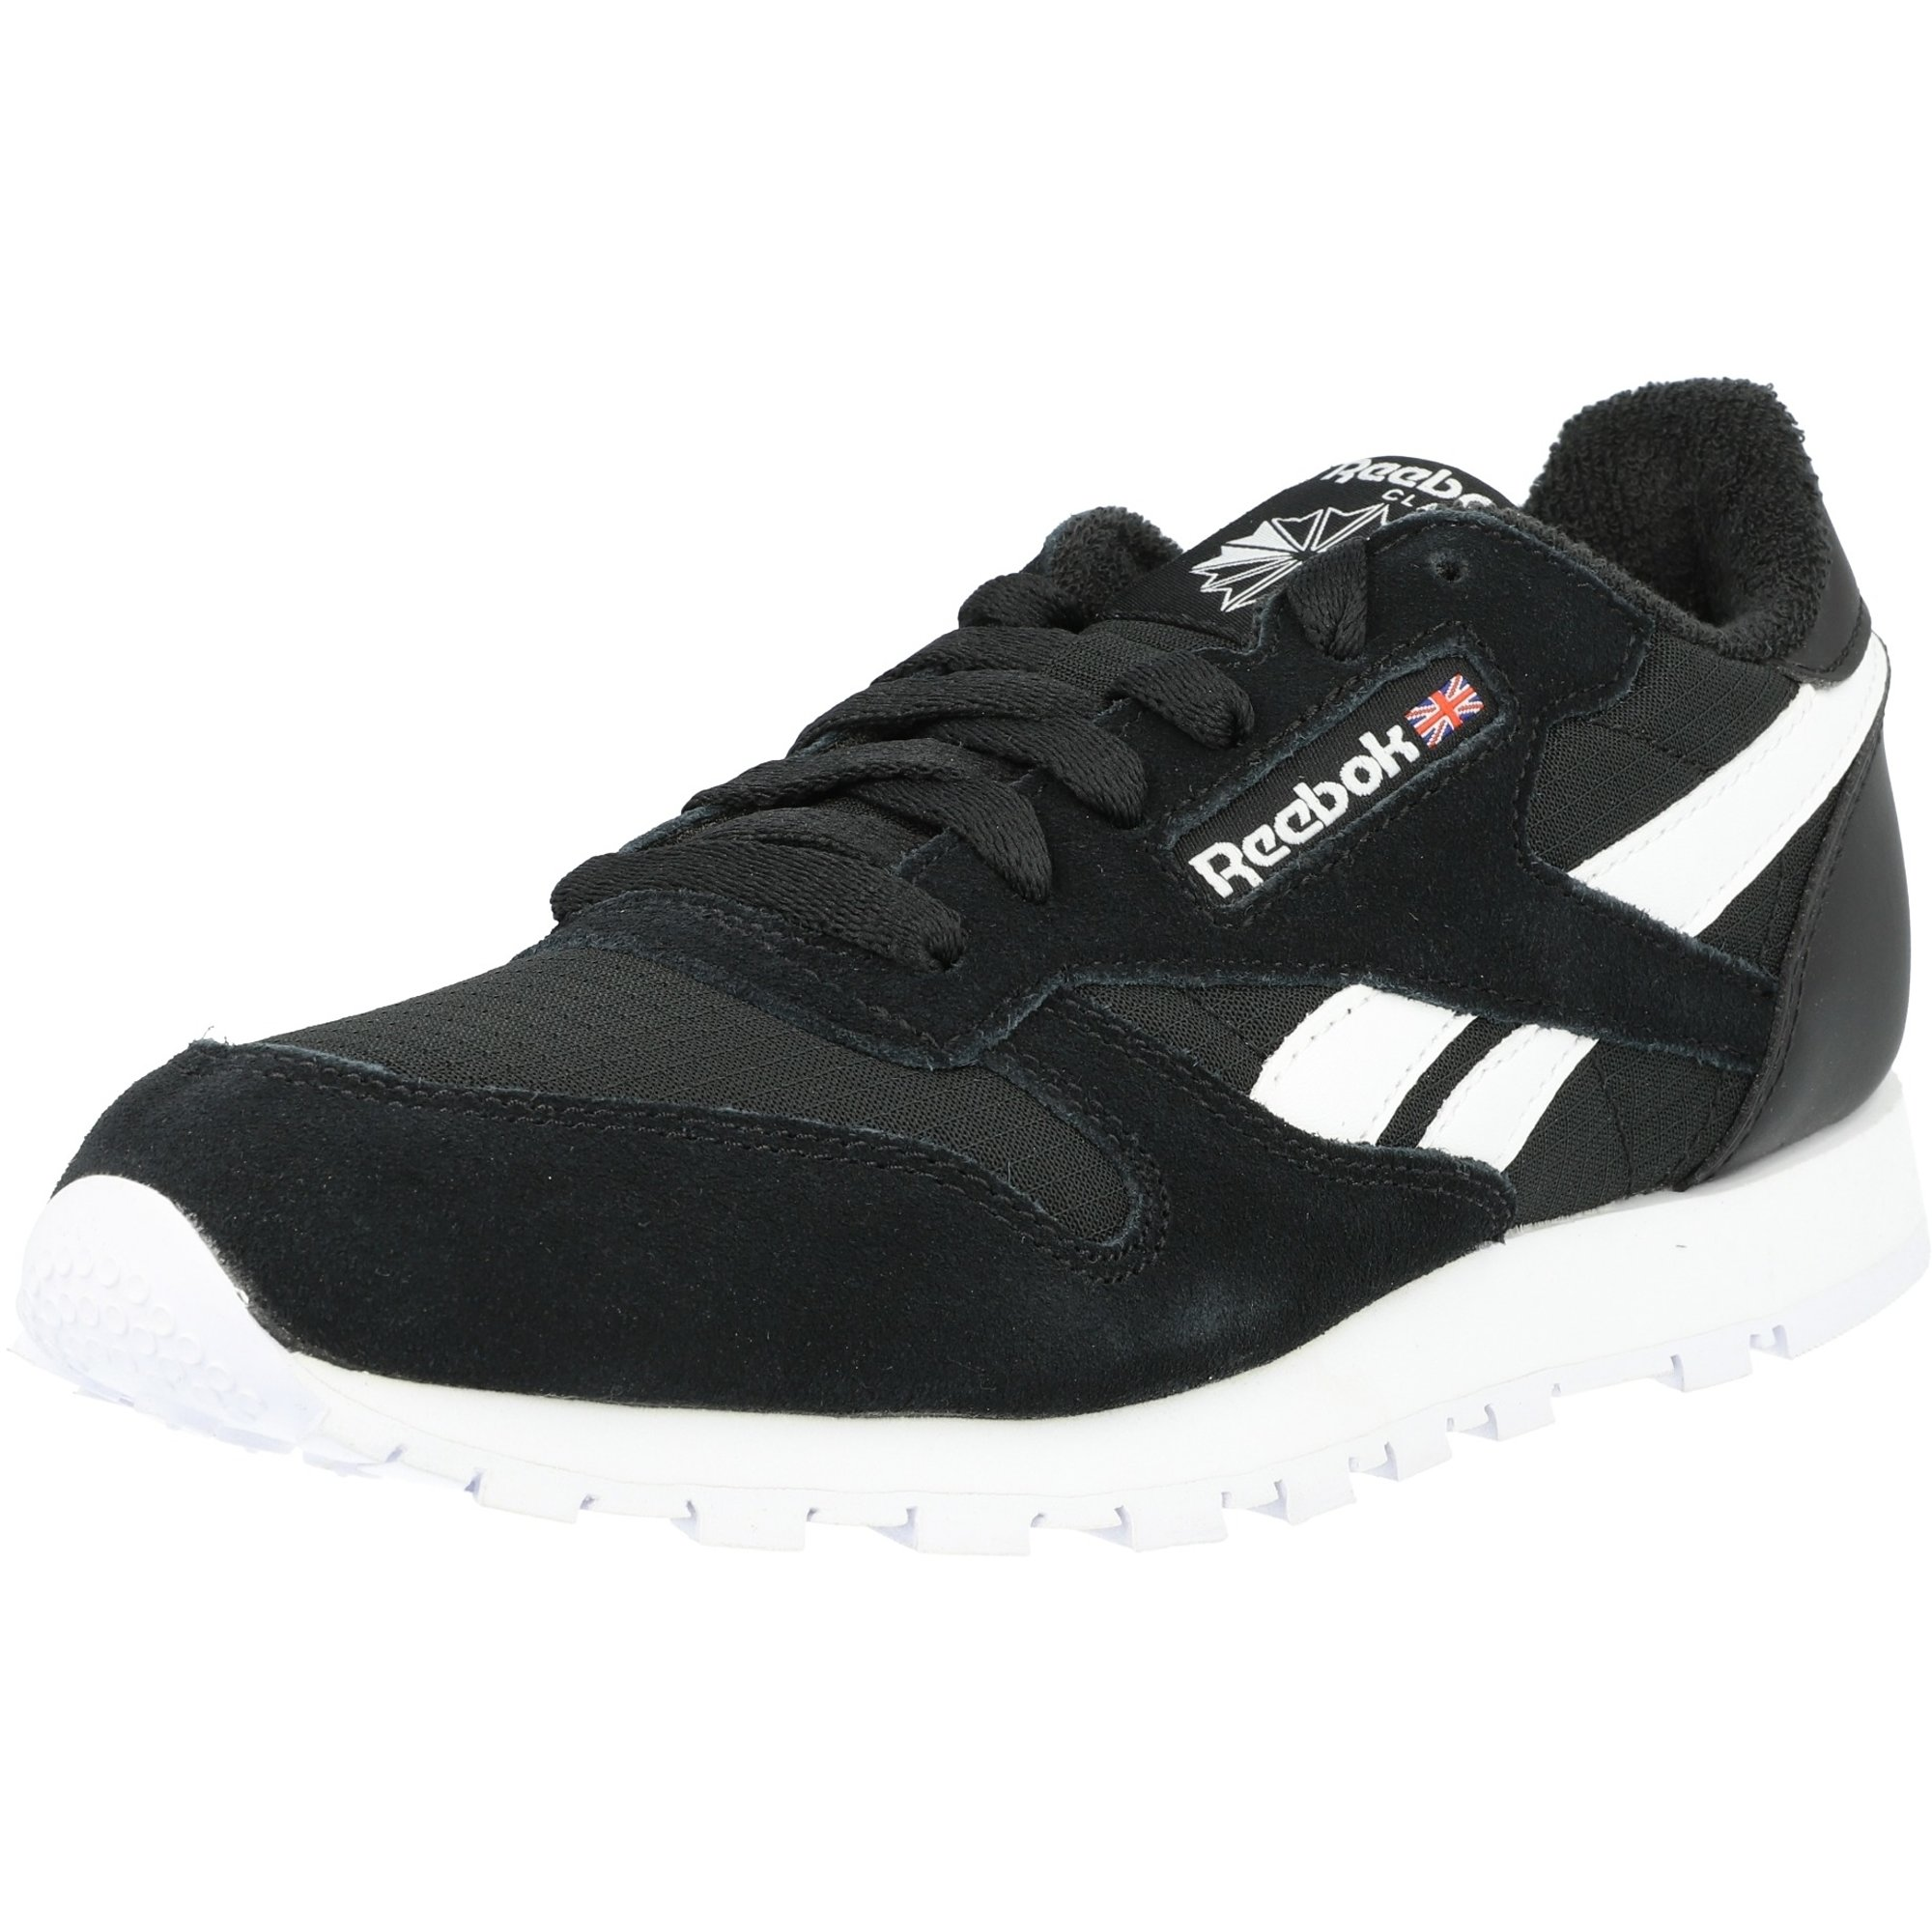 Reebok Classic Leather Black/White